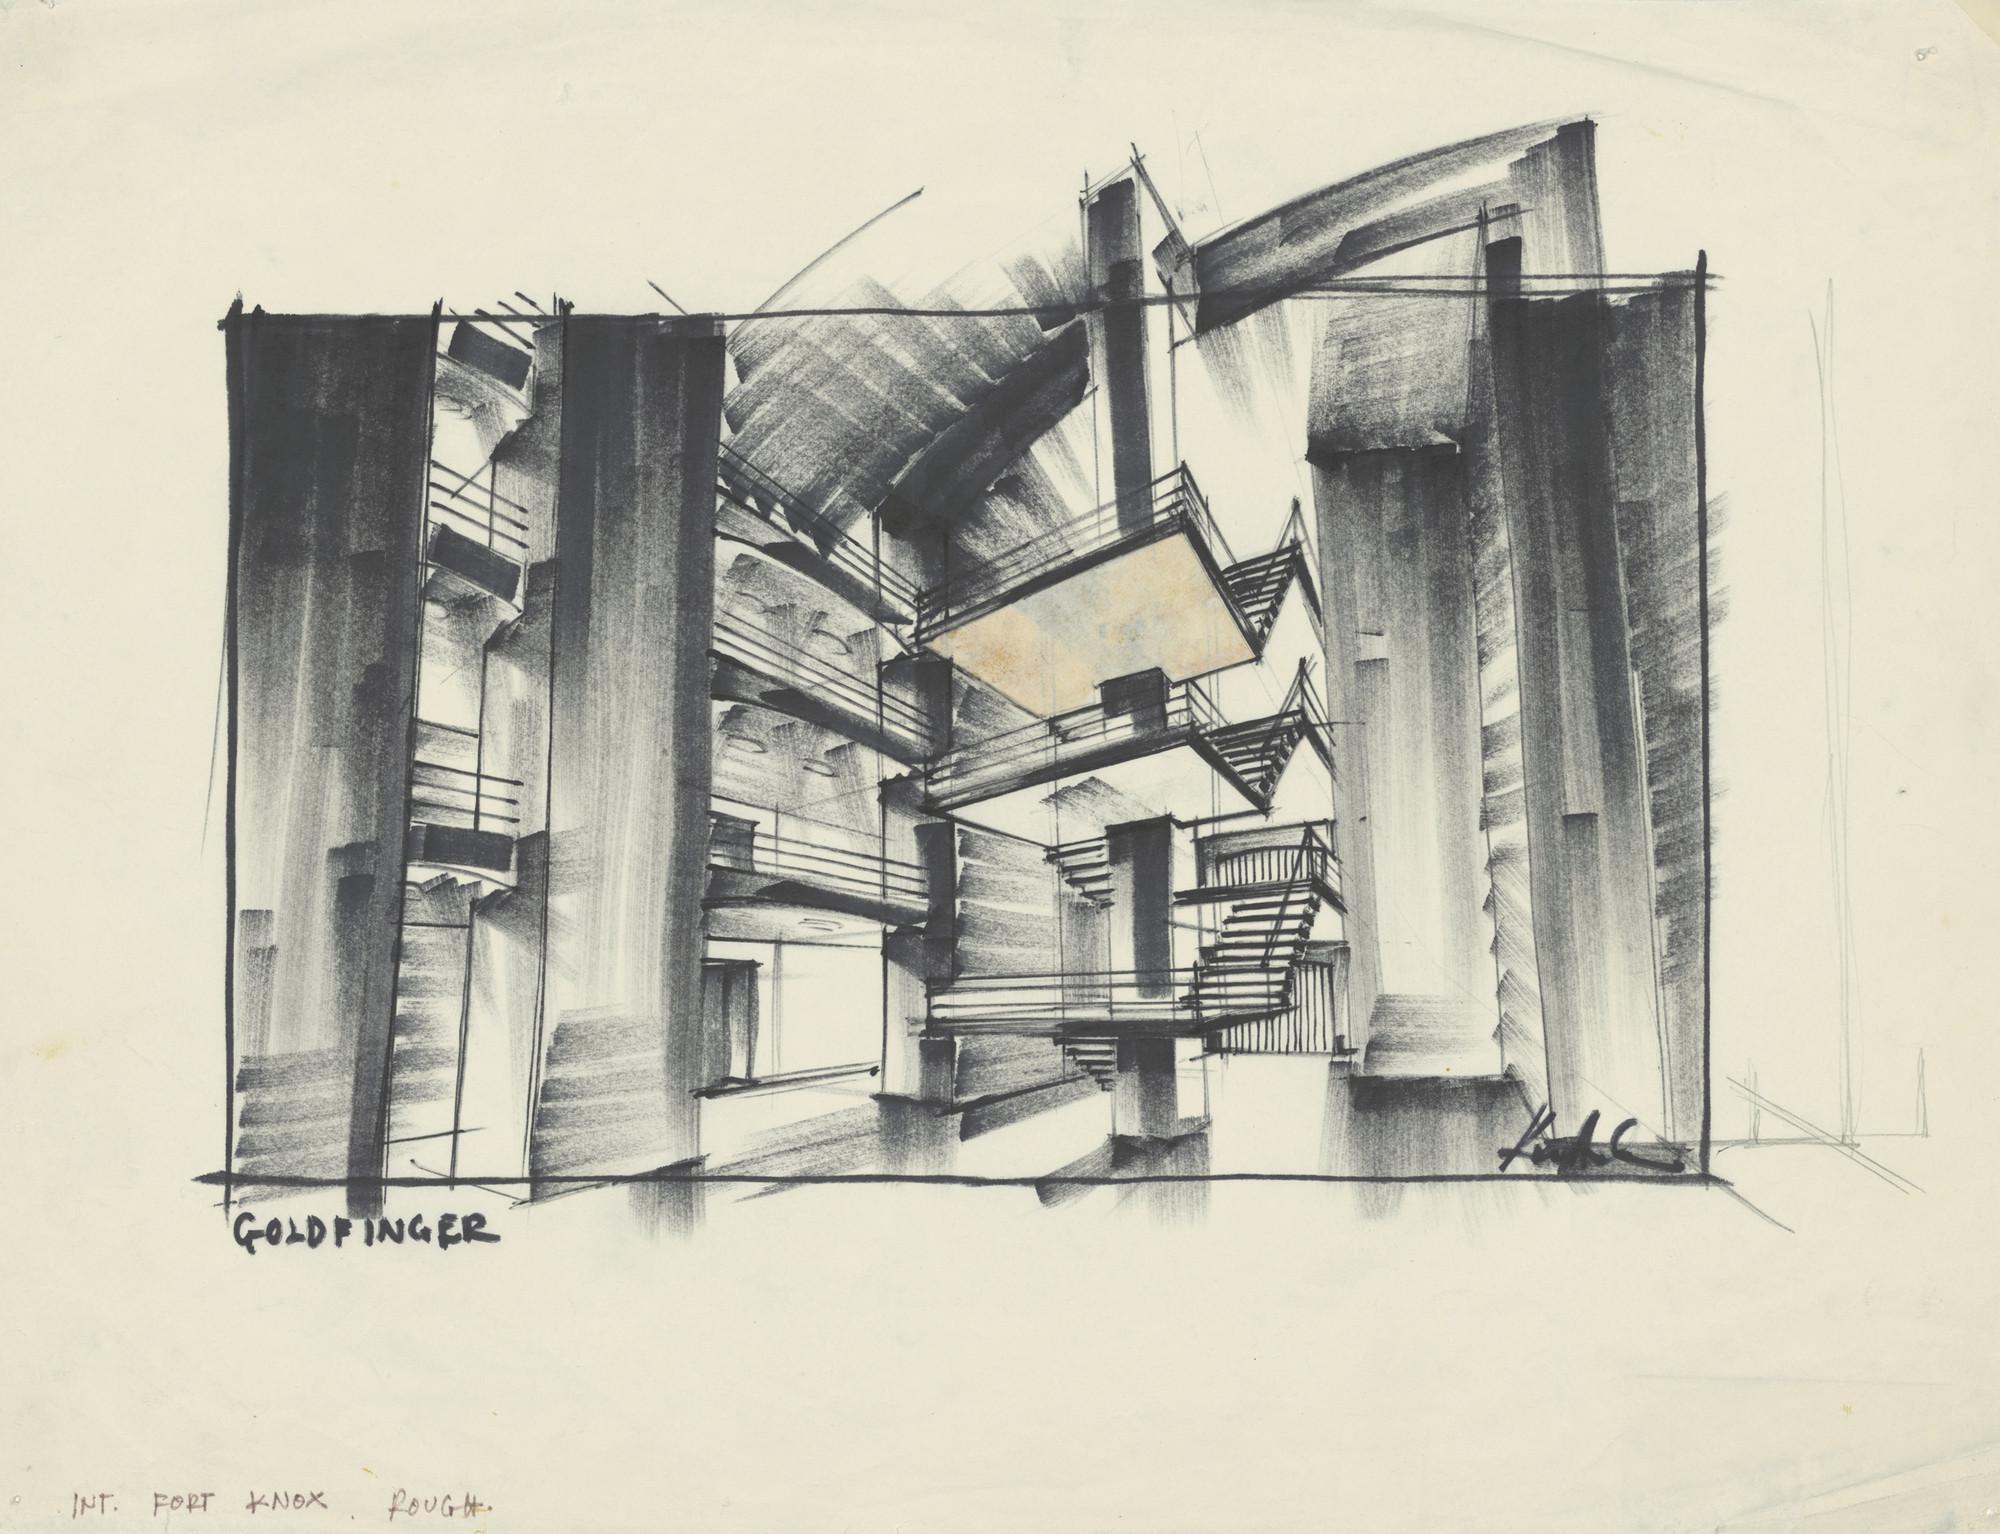 "Meet the Film Industry's Most Successful Architect in Deutsche Kinemathek's Latest Exhibition, Design of ""Fort Knox"" for Goldfinger, GB/USA 1964, Directed by Guy Hamilton. Image © Sir Ken Adam, Deutsche Kinemathek – Ken Adam Archive"